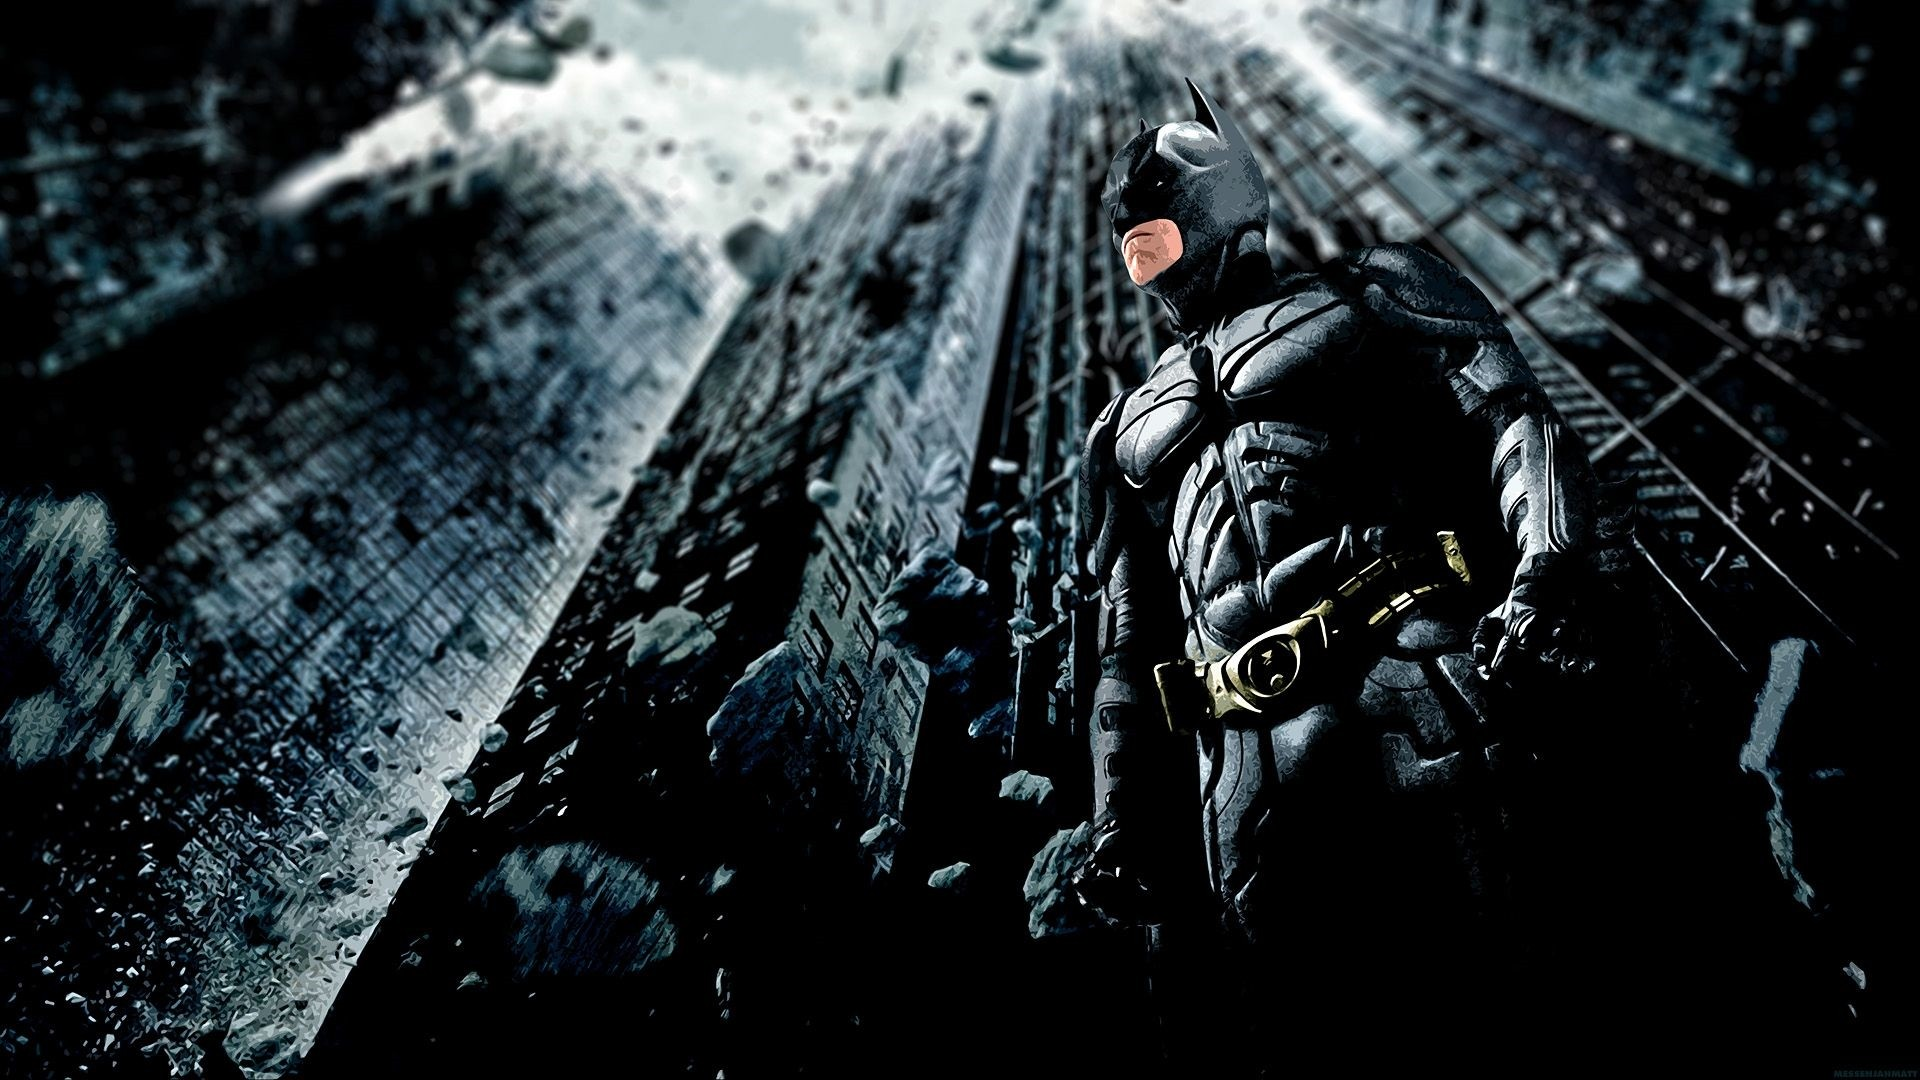 Dark Knight free download wallpaper